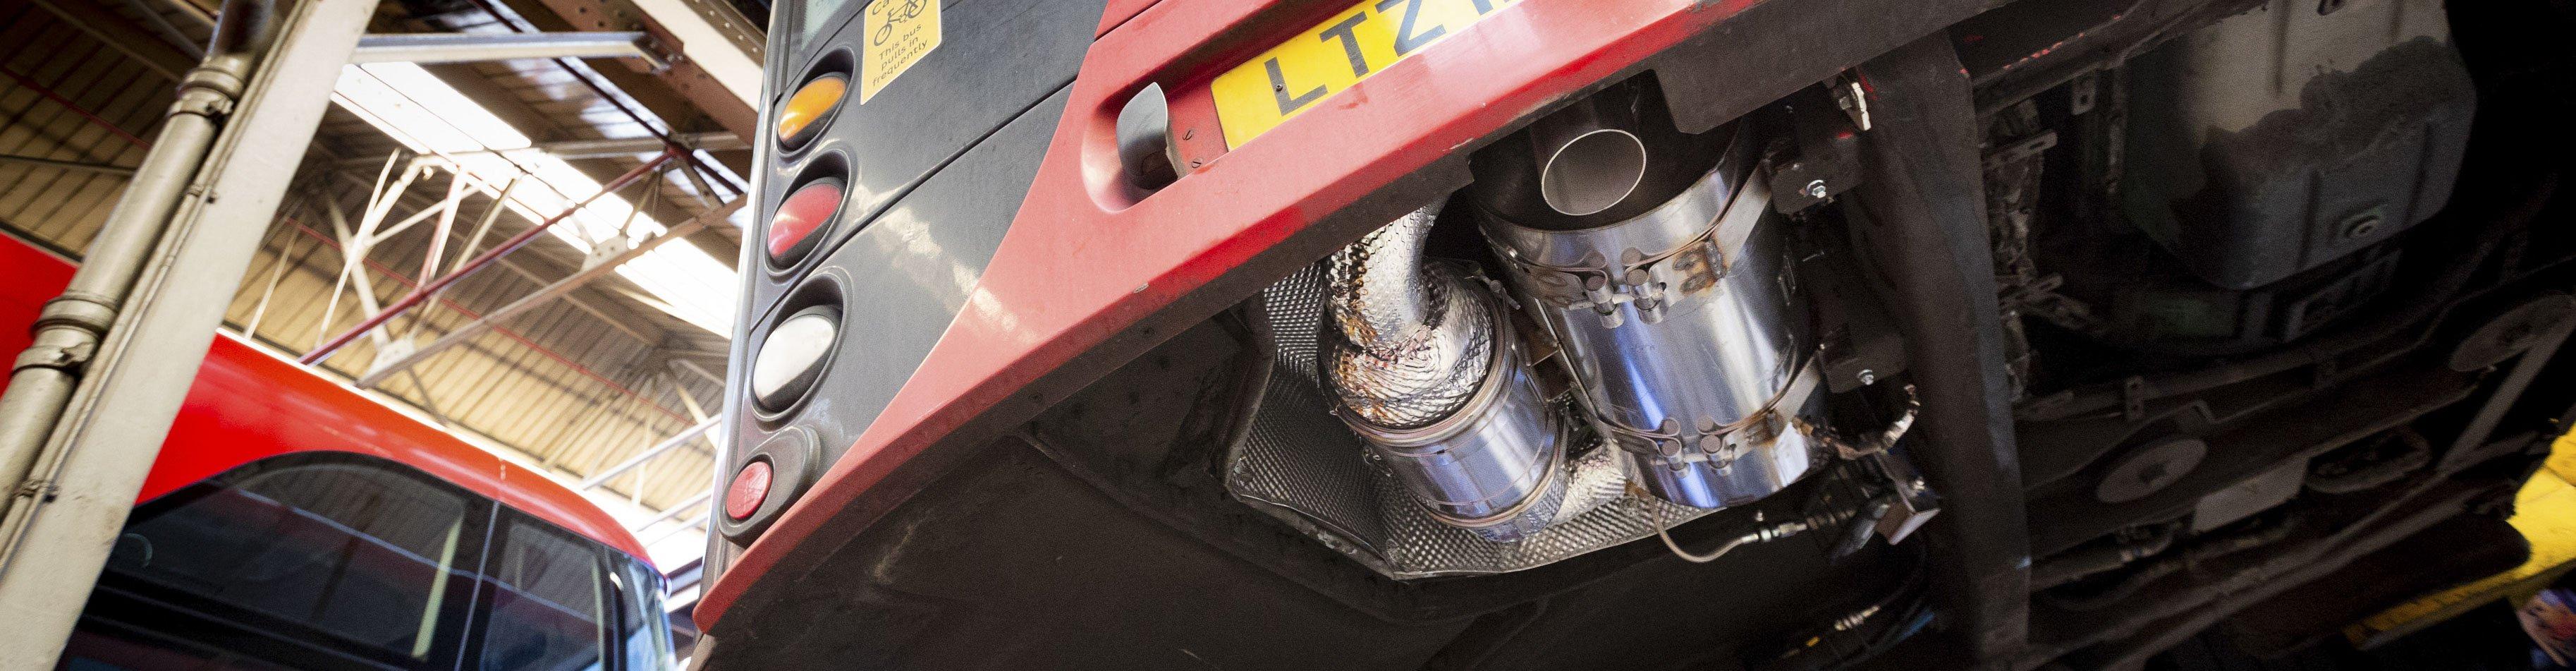 new ULEZ compliant exhaust